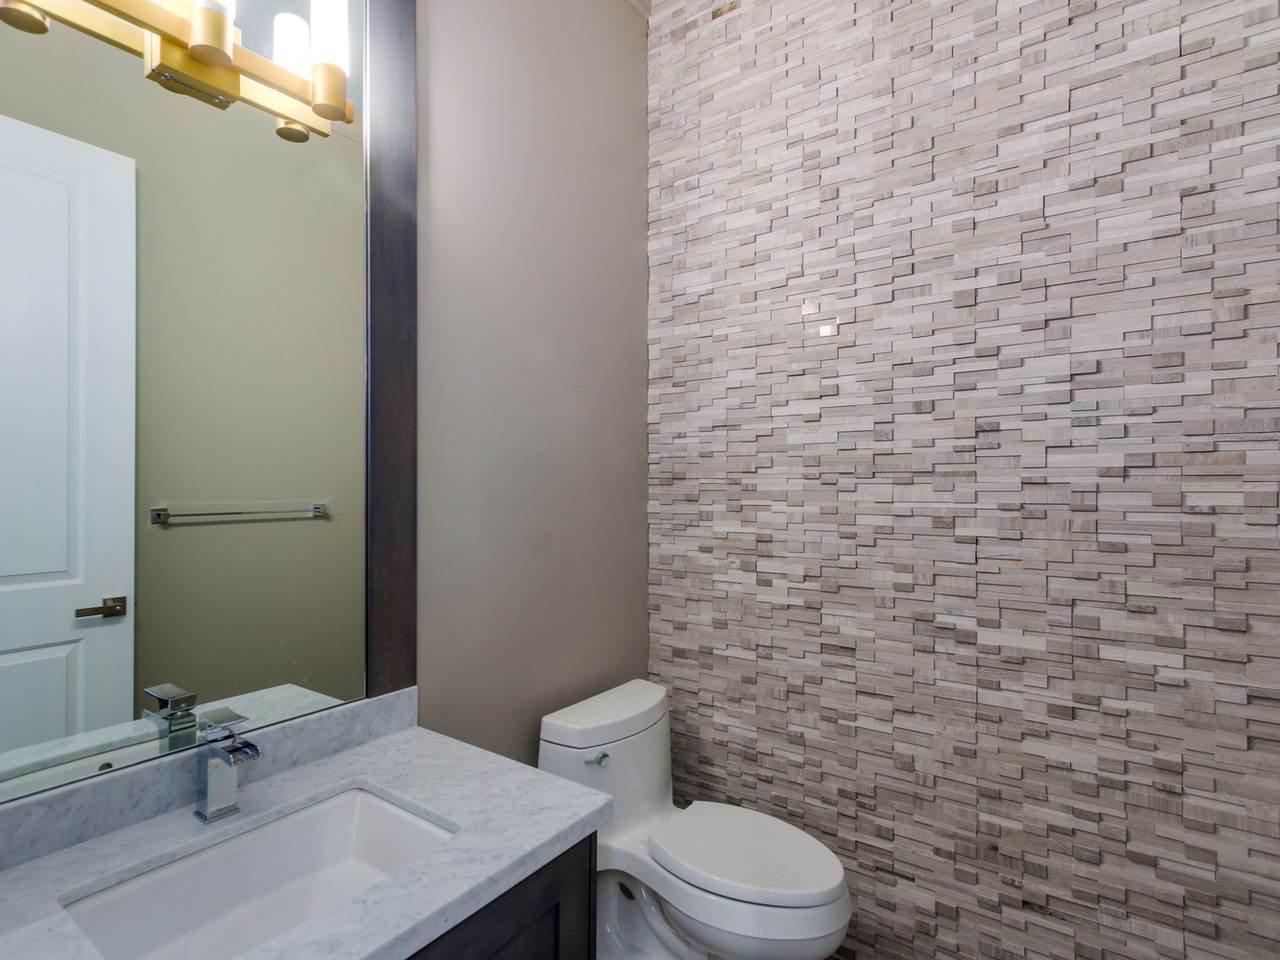 Photo 12: Photos: 1560 MAPLE Street: White Rock House for sale (South Surrey White Rock)  : MLS®# R2138926